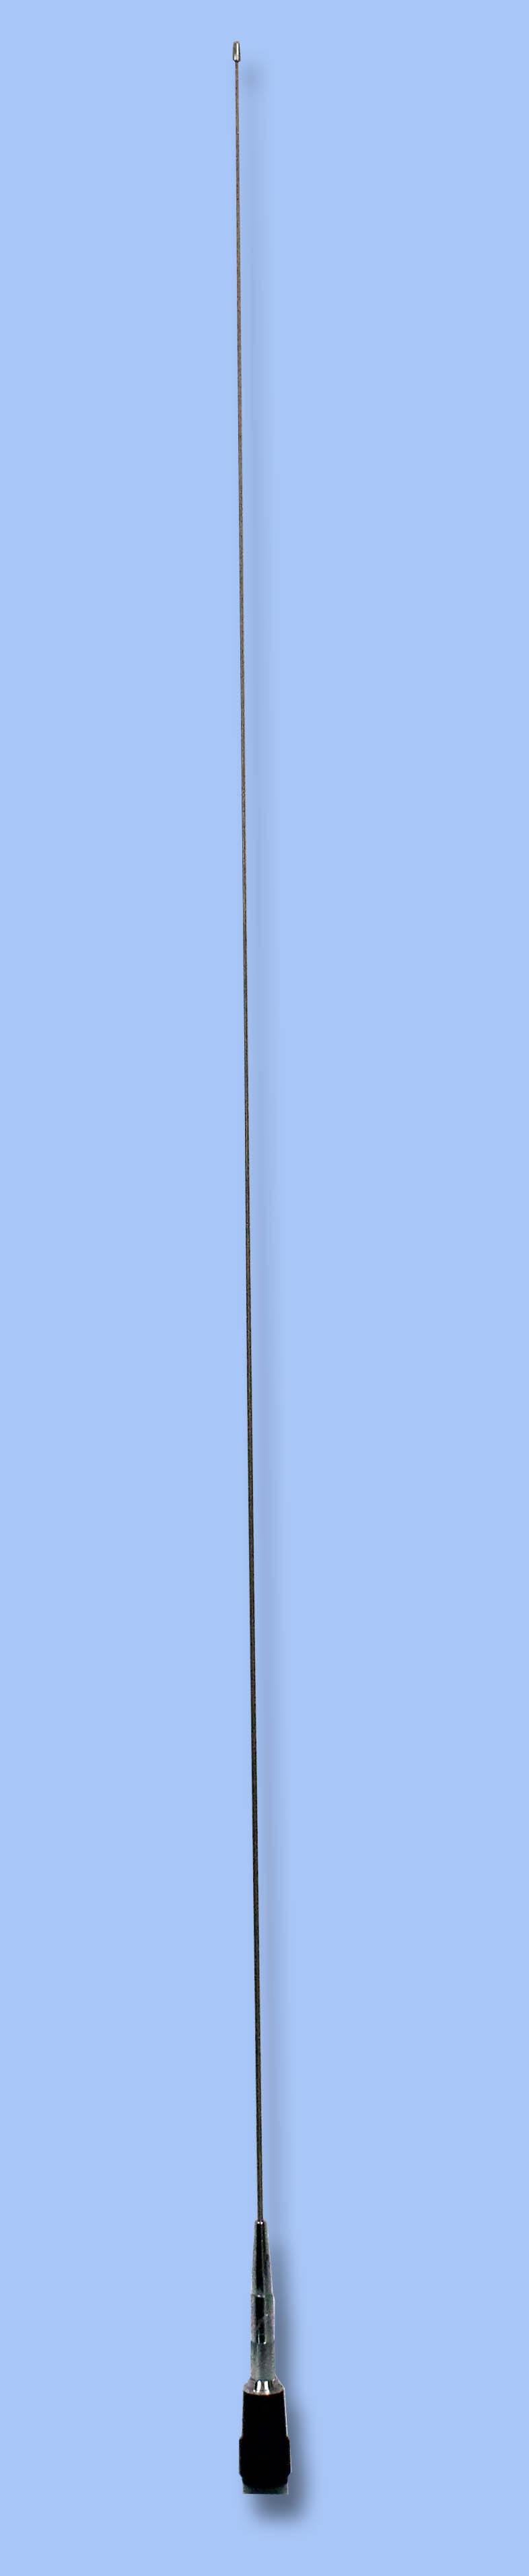 VHF MOBILE ANTENNA MODEL T-6 (ราคาพิเศษ)